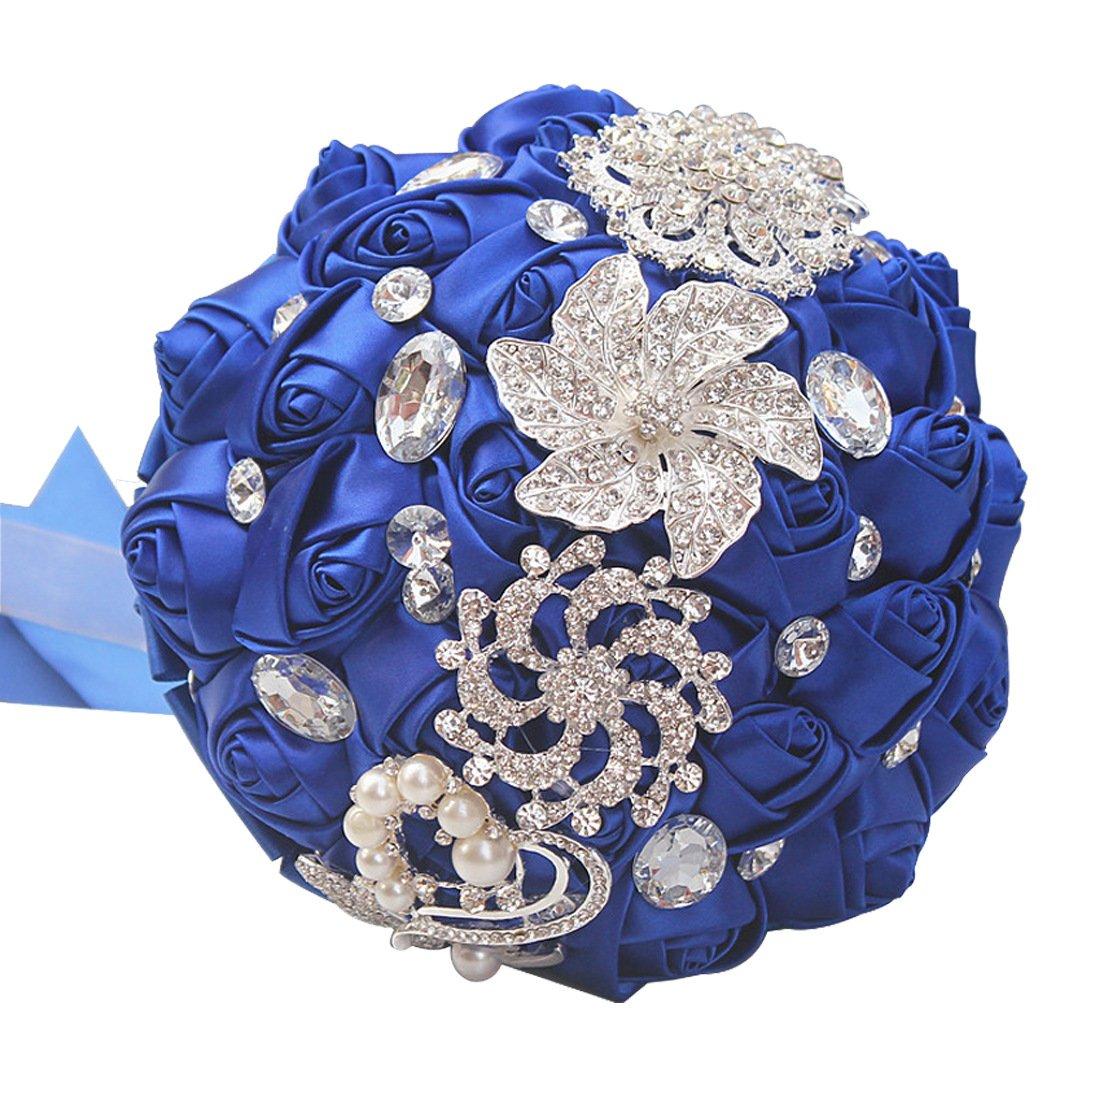 cozydecor Romantic Wedding Bride holdingブーケブローチバラダイヤモンドパールリボンバレンタインの日ギフトChristmas Present ブルー SHD0011RB B0779D72QZ  ロイヤルブルー